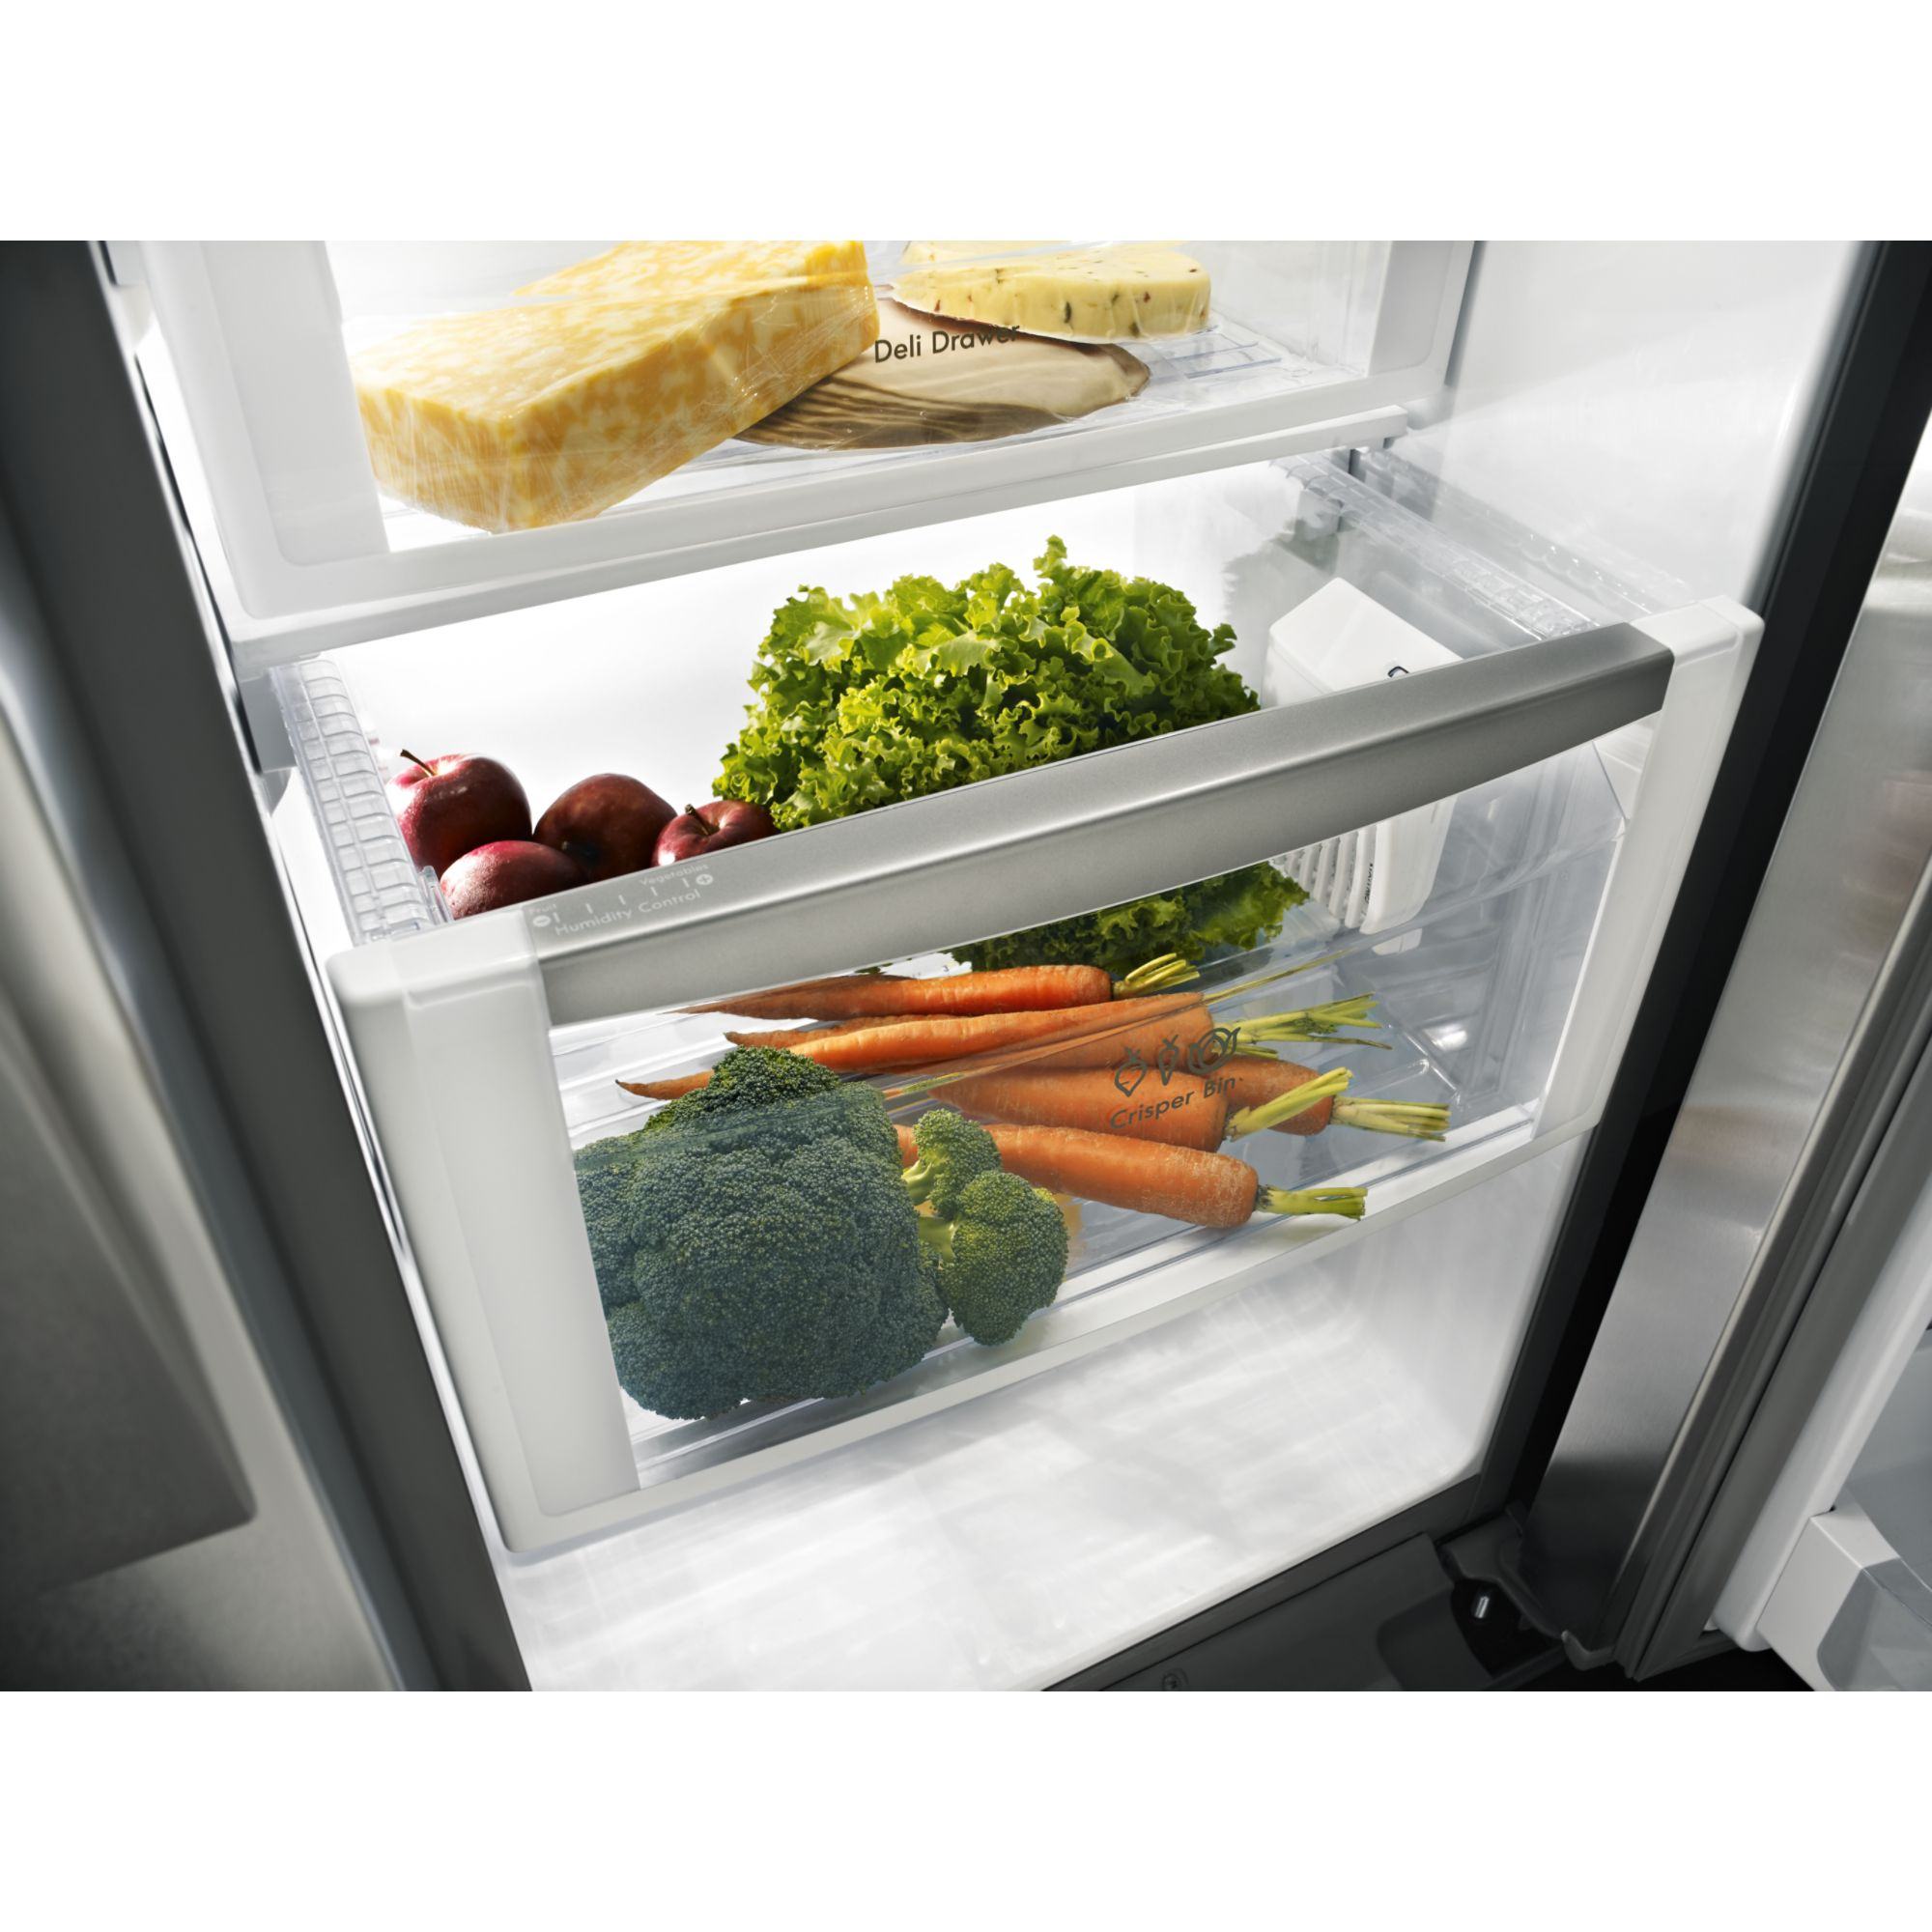 Kenmore Elite 24.5 cu. ft. Side-by-Side Refrigerator w/ Measured Fill - Stainless Steel